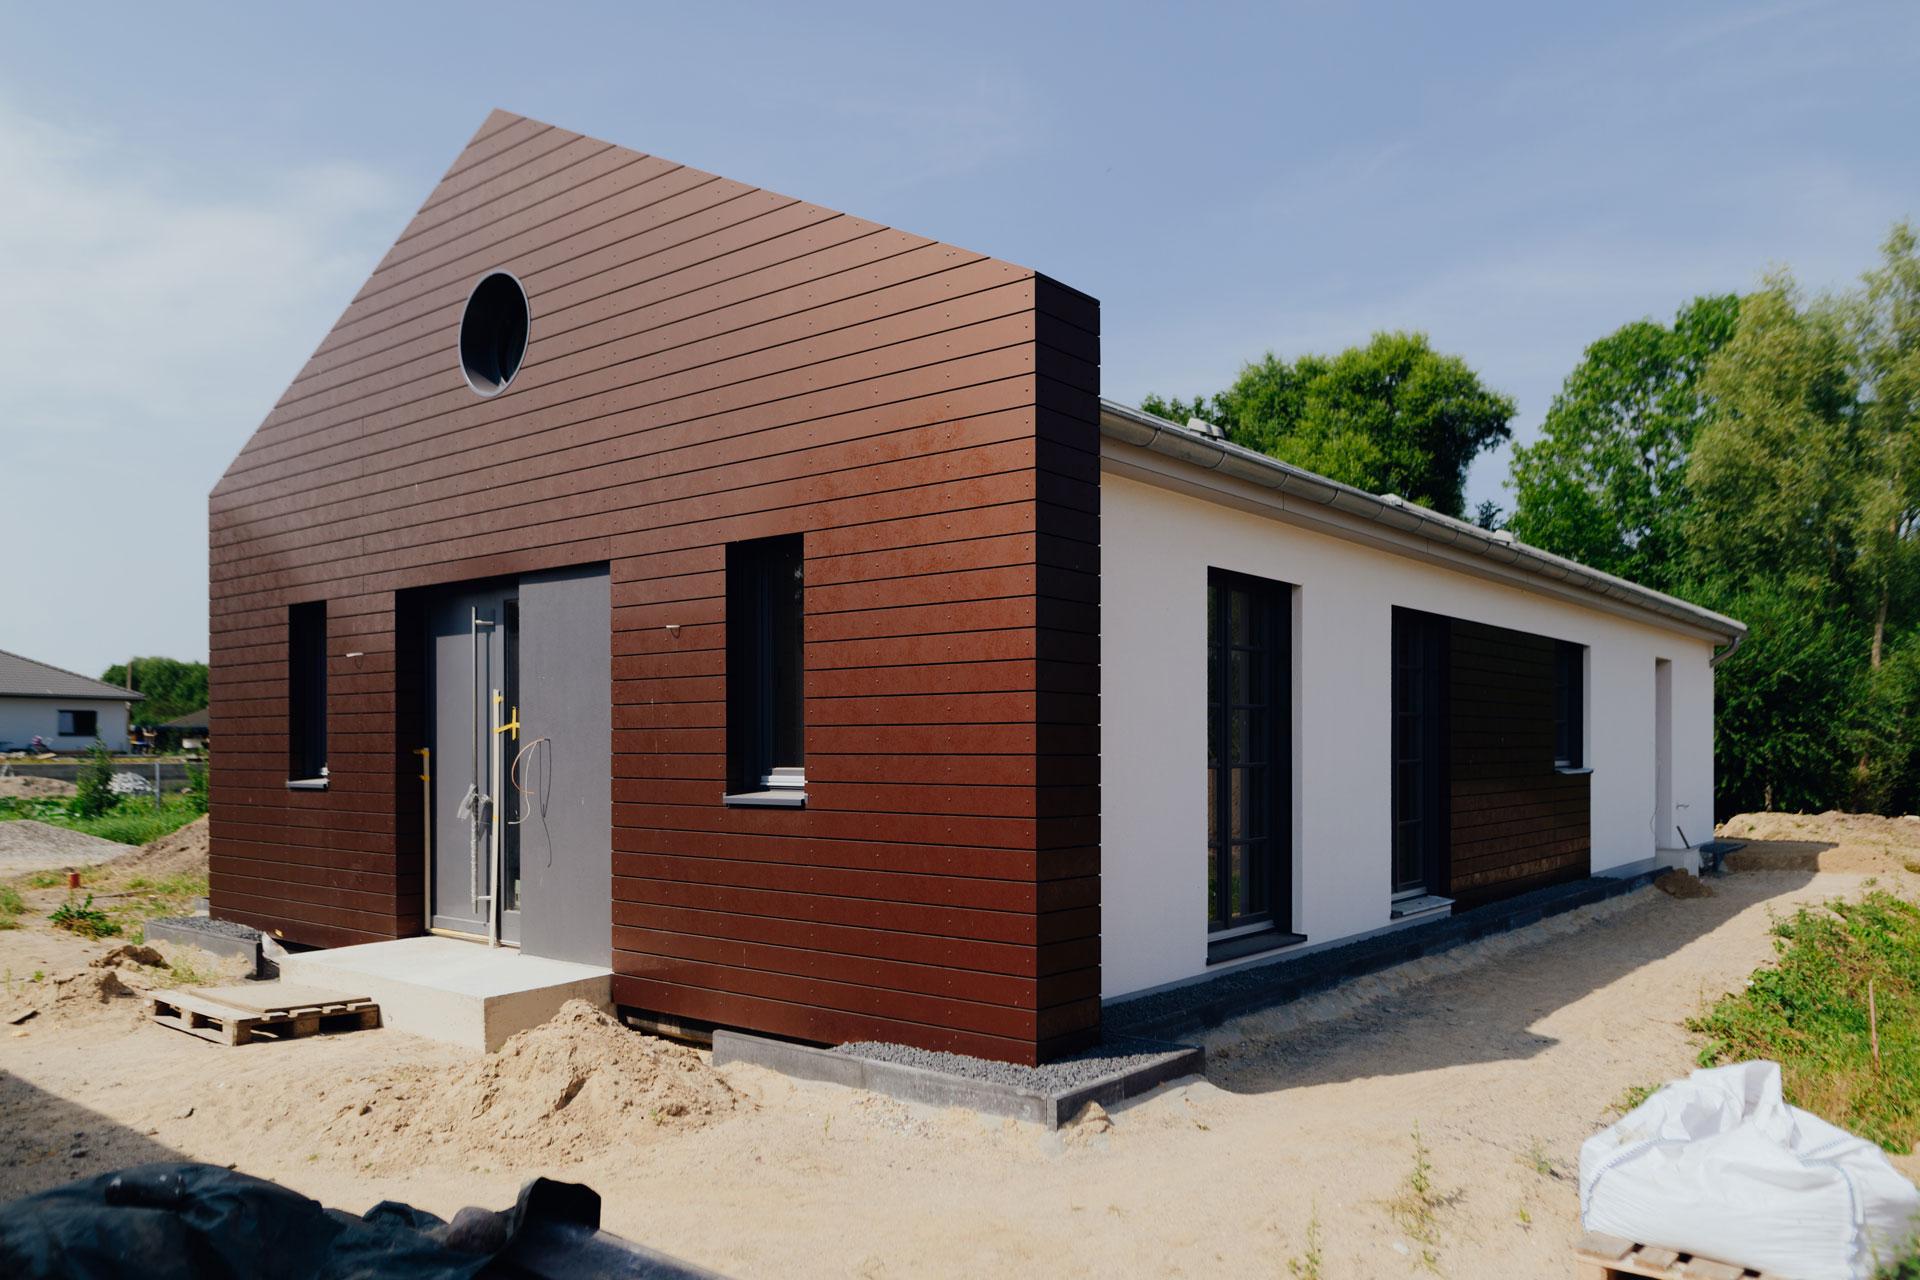 Einfamilienhaus im Landkreis Bad Doberan (08) / Nahaufnahme